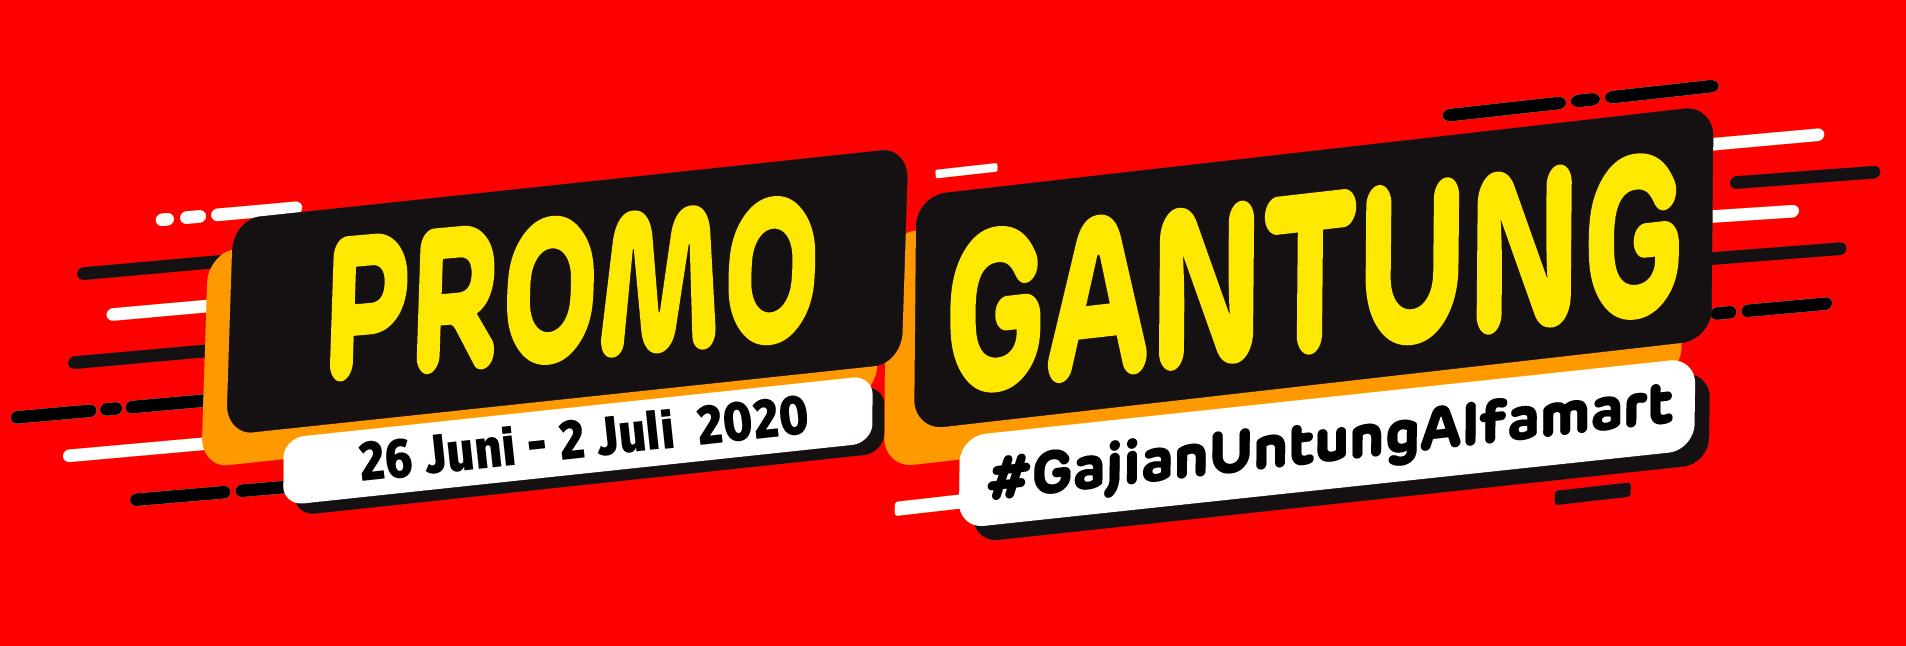 Promo Gantung Alfamart 26 Juni - 2 Juli 2020